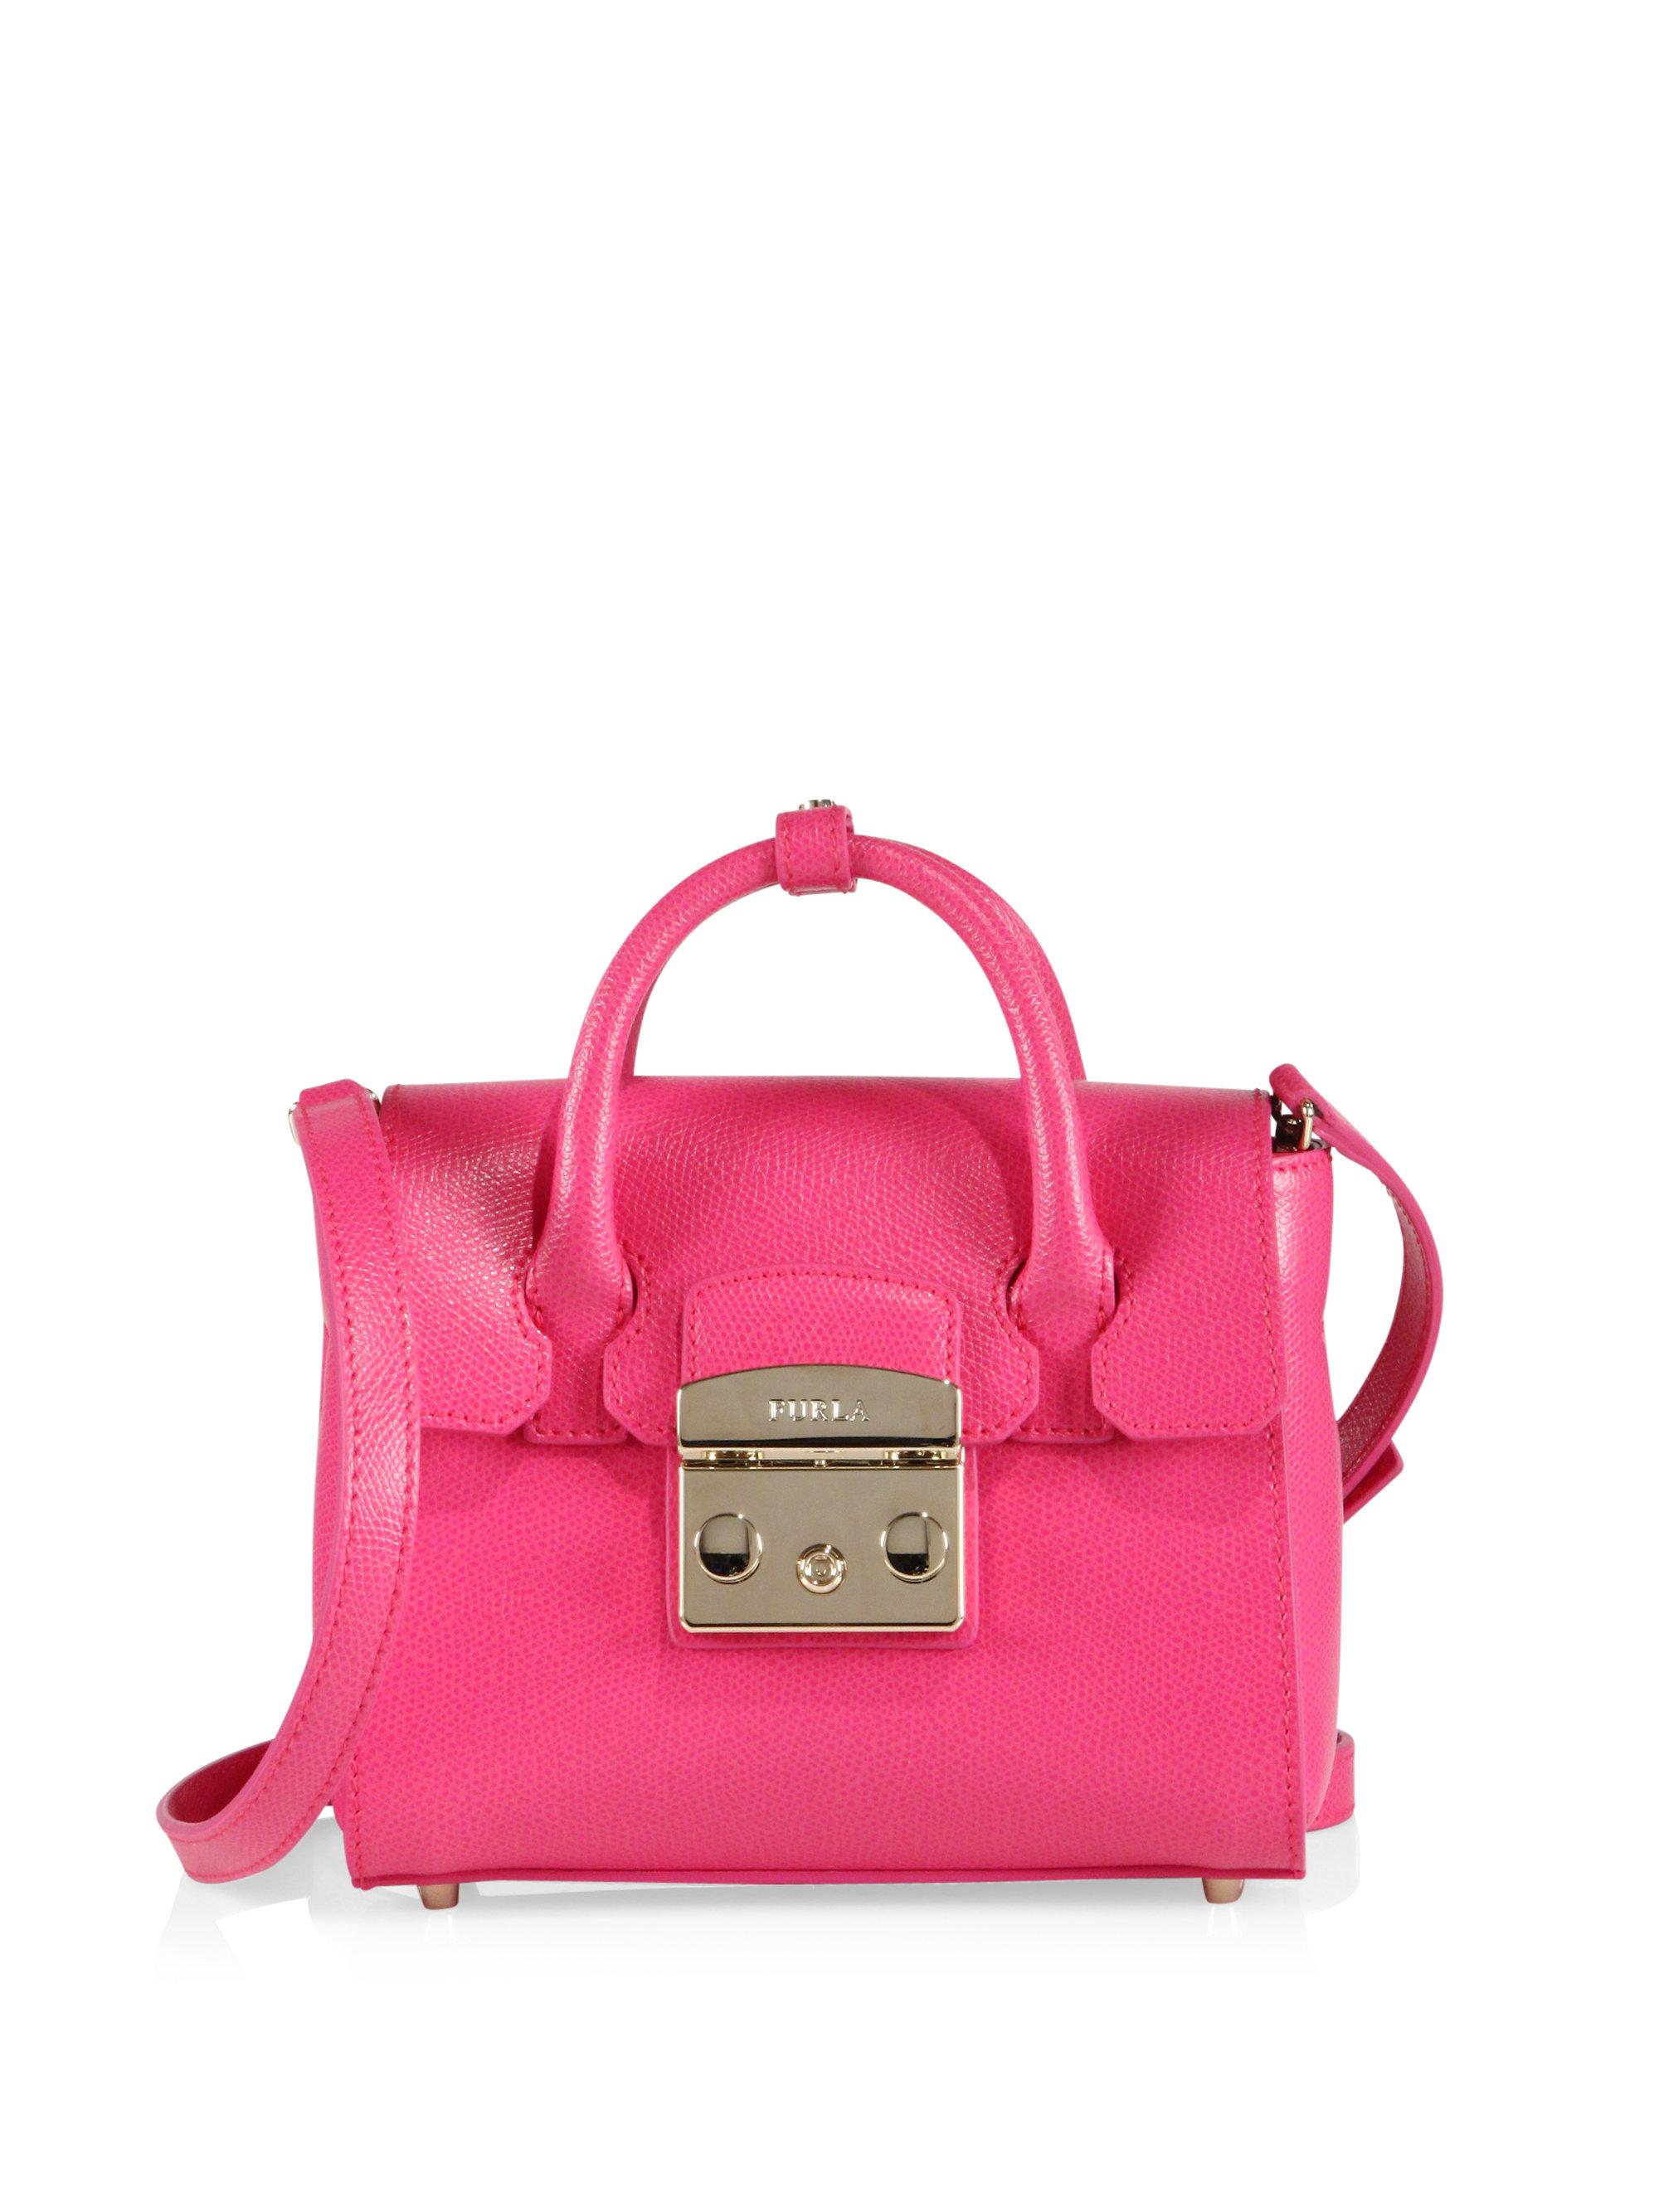 furla metropolis mini leather satchel in pink lyst. Black Bedroom Furniture Sets. Home Design Ideas